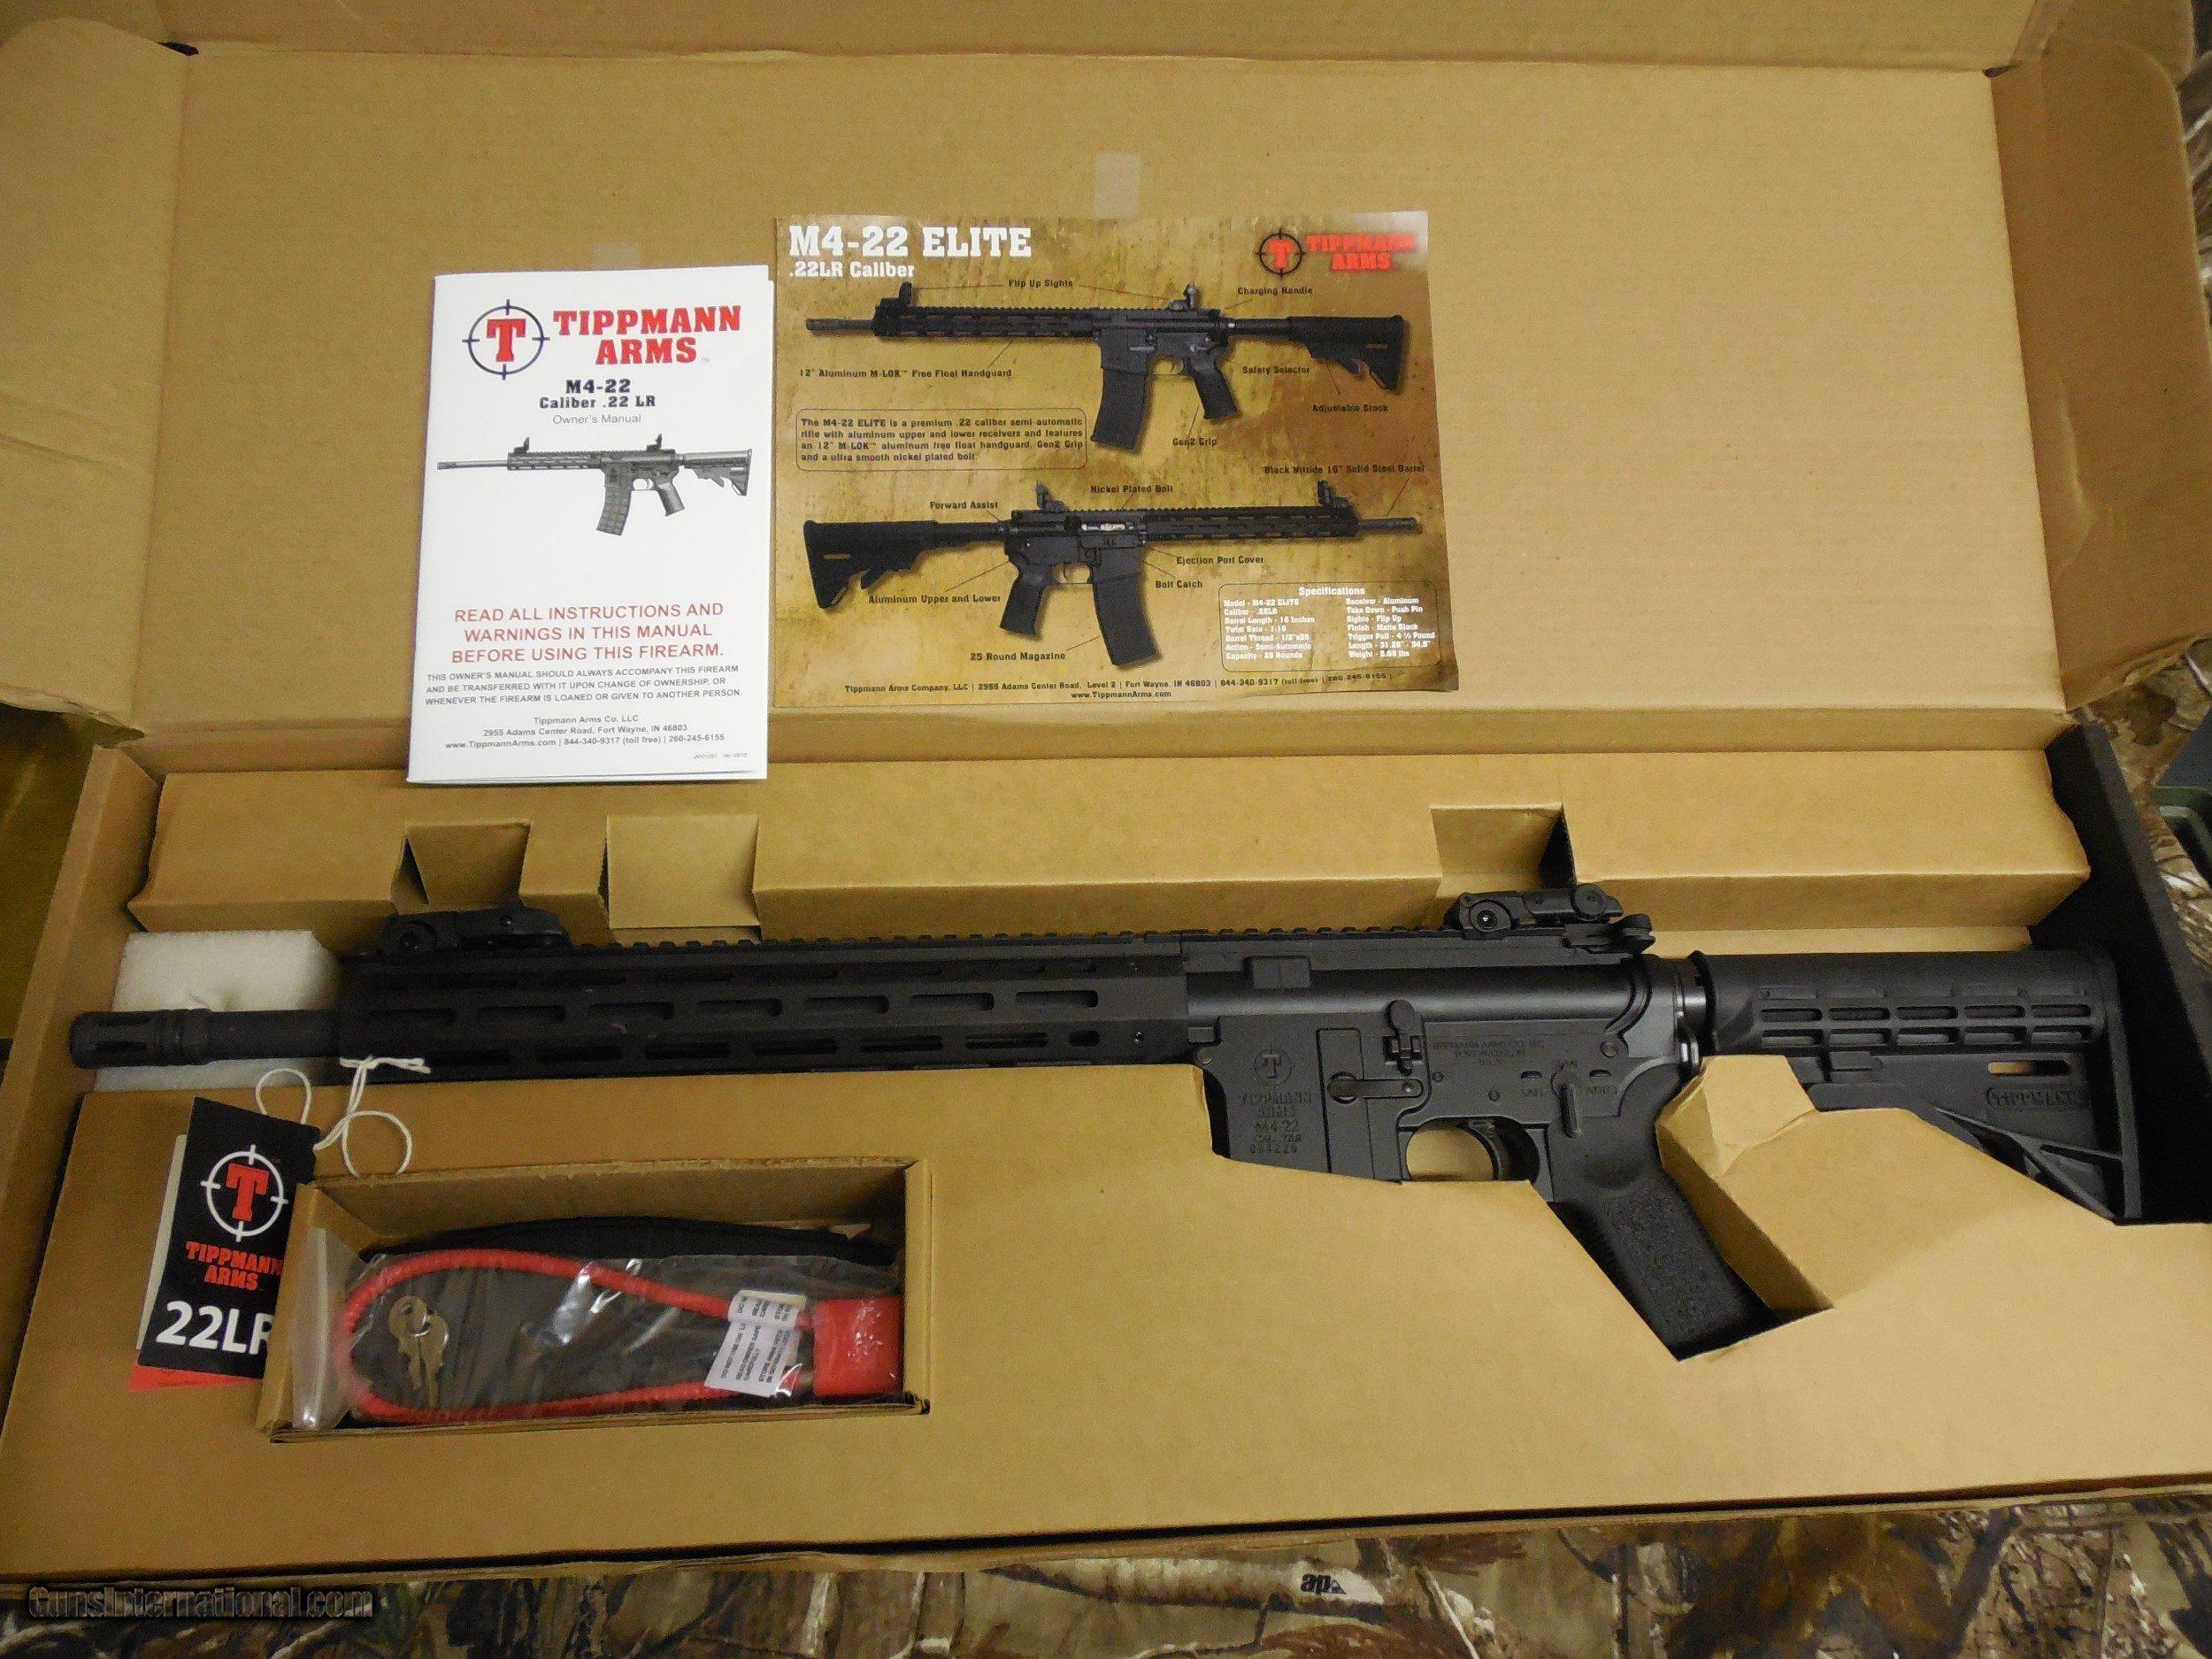 AR-15 M4 22-L R  TIPPMANN ELITE-L TACTICAL RIFLE, 25 ROUND